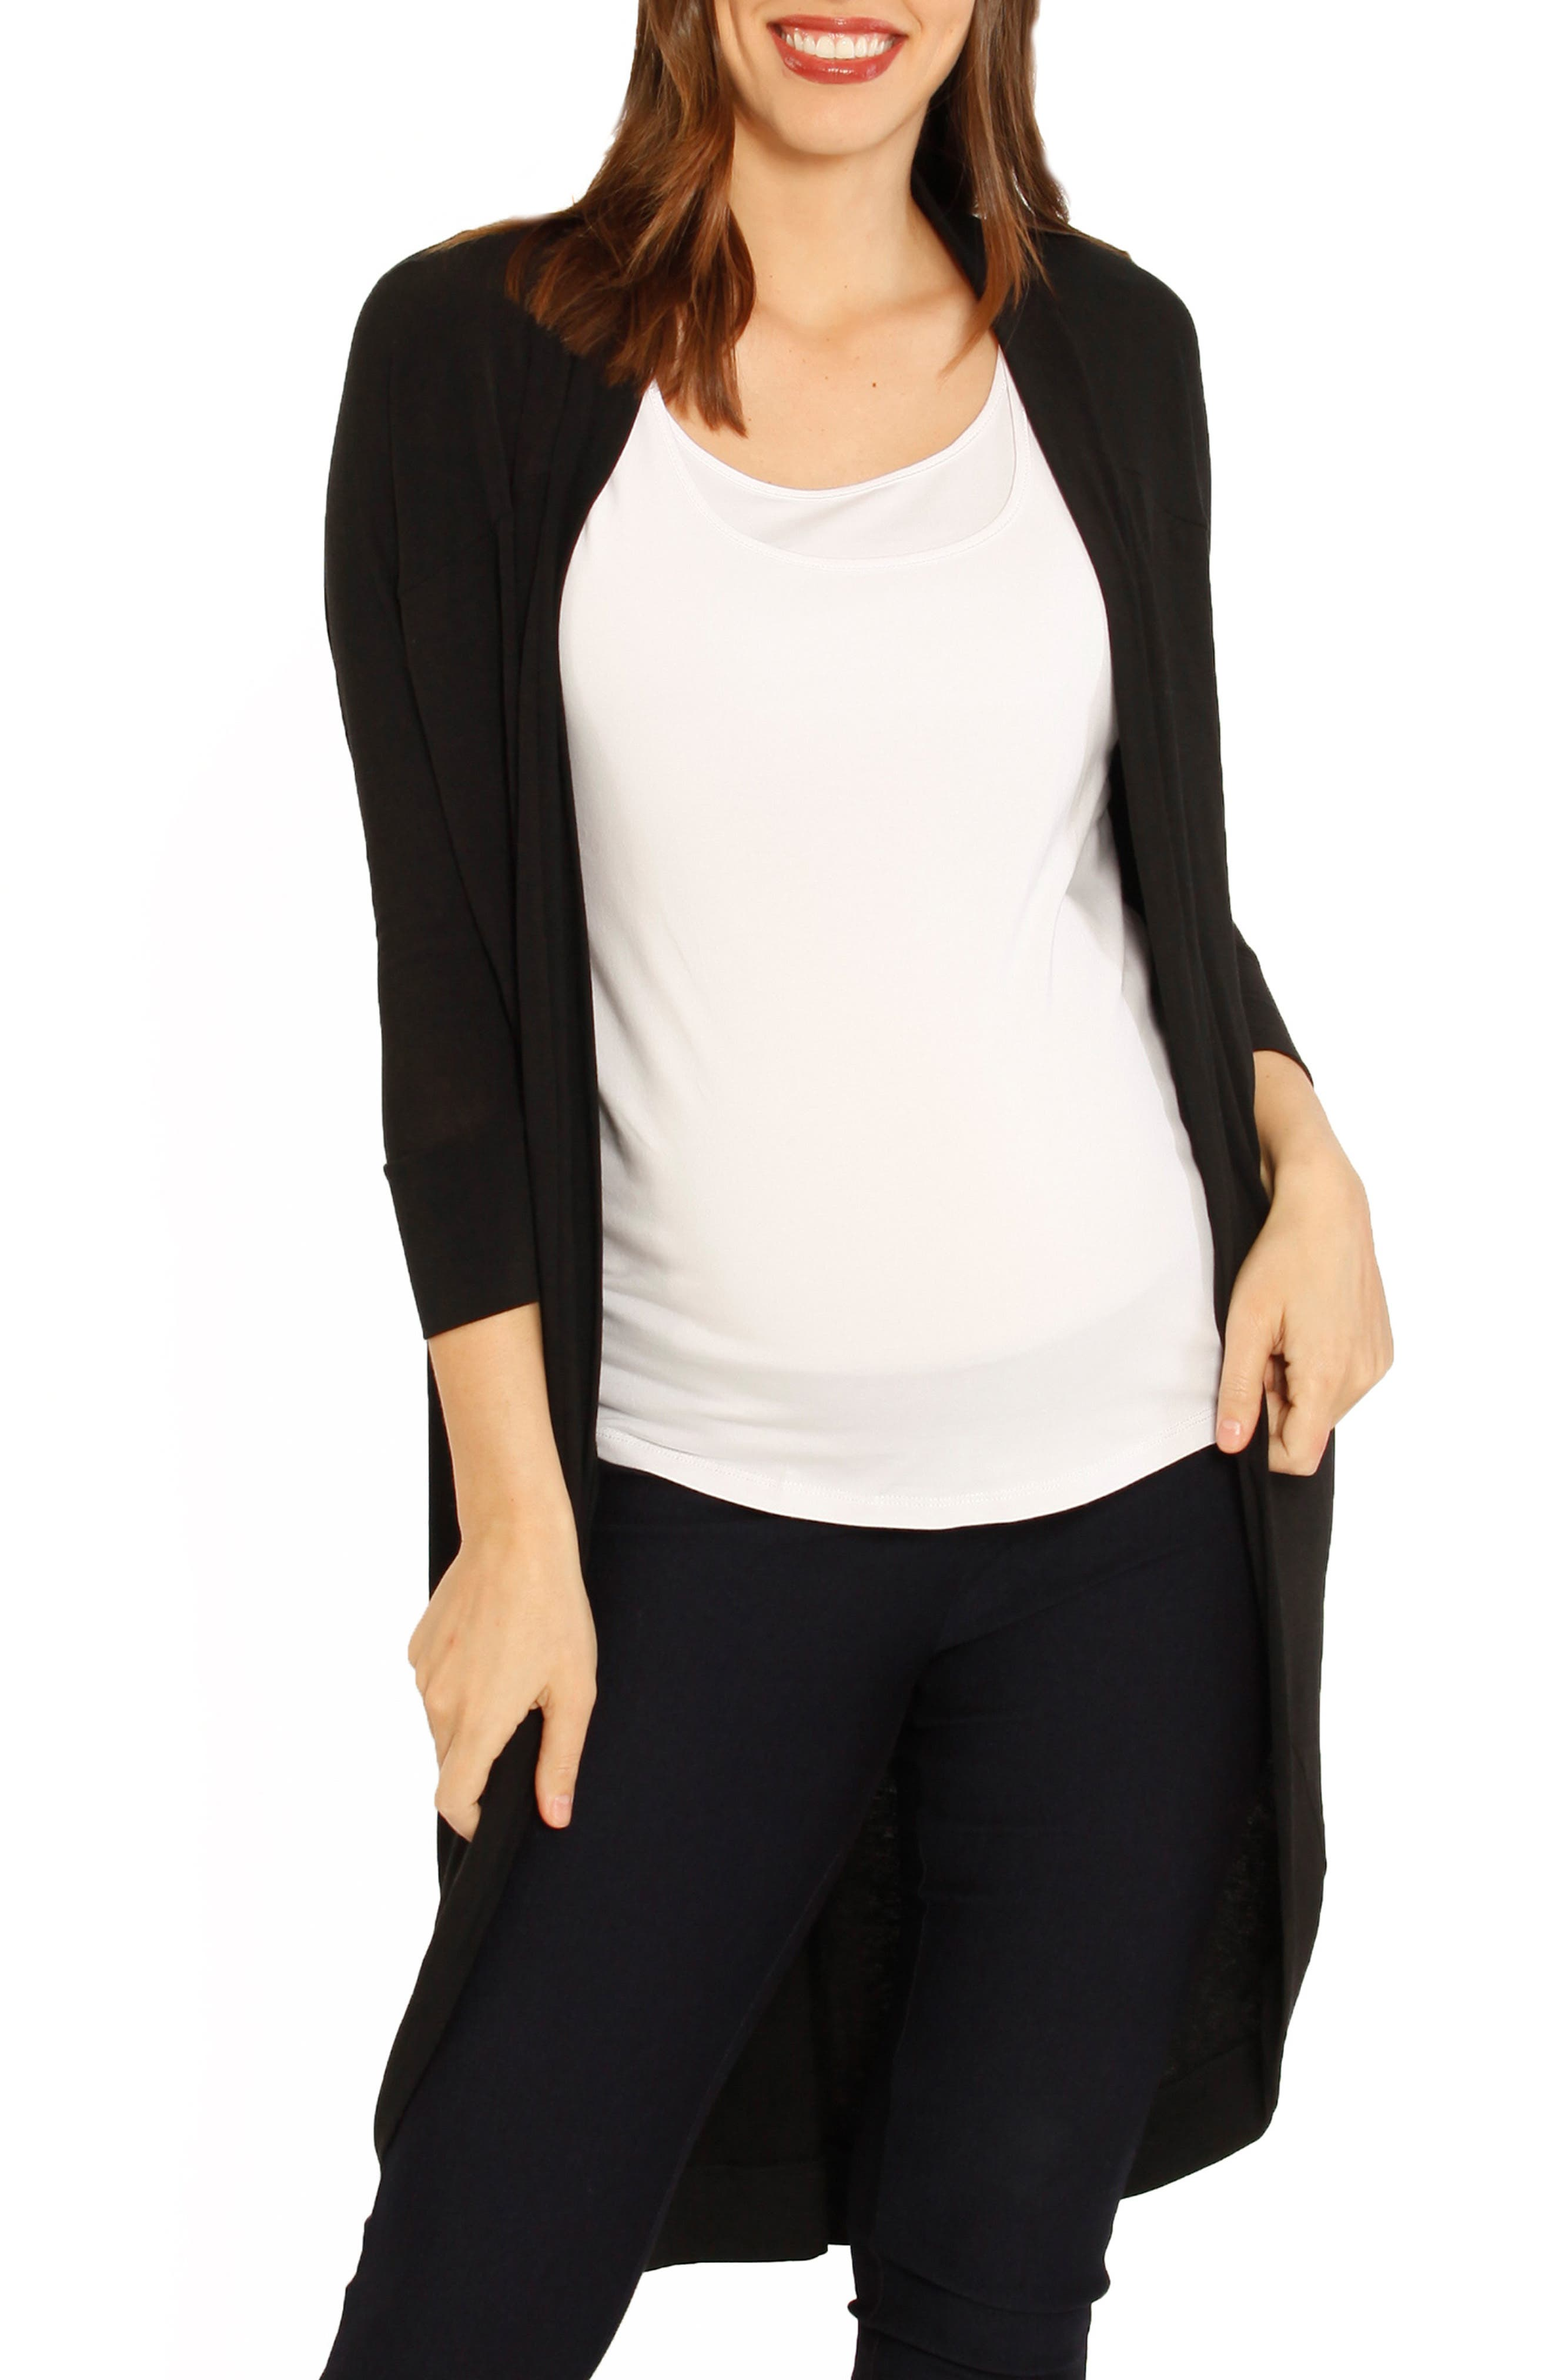 ANGEL MATERNITY Scooped Maternity Cardigan, Main, color, BLACK